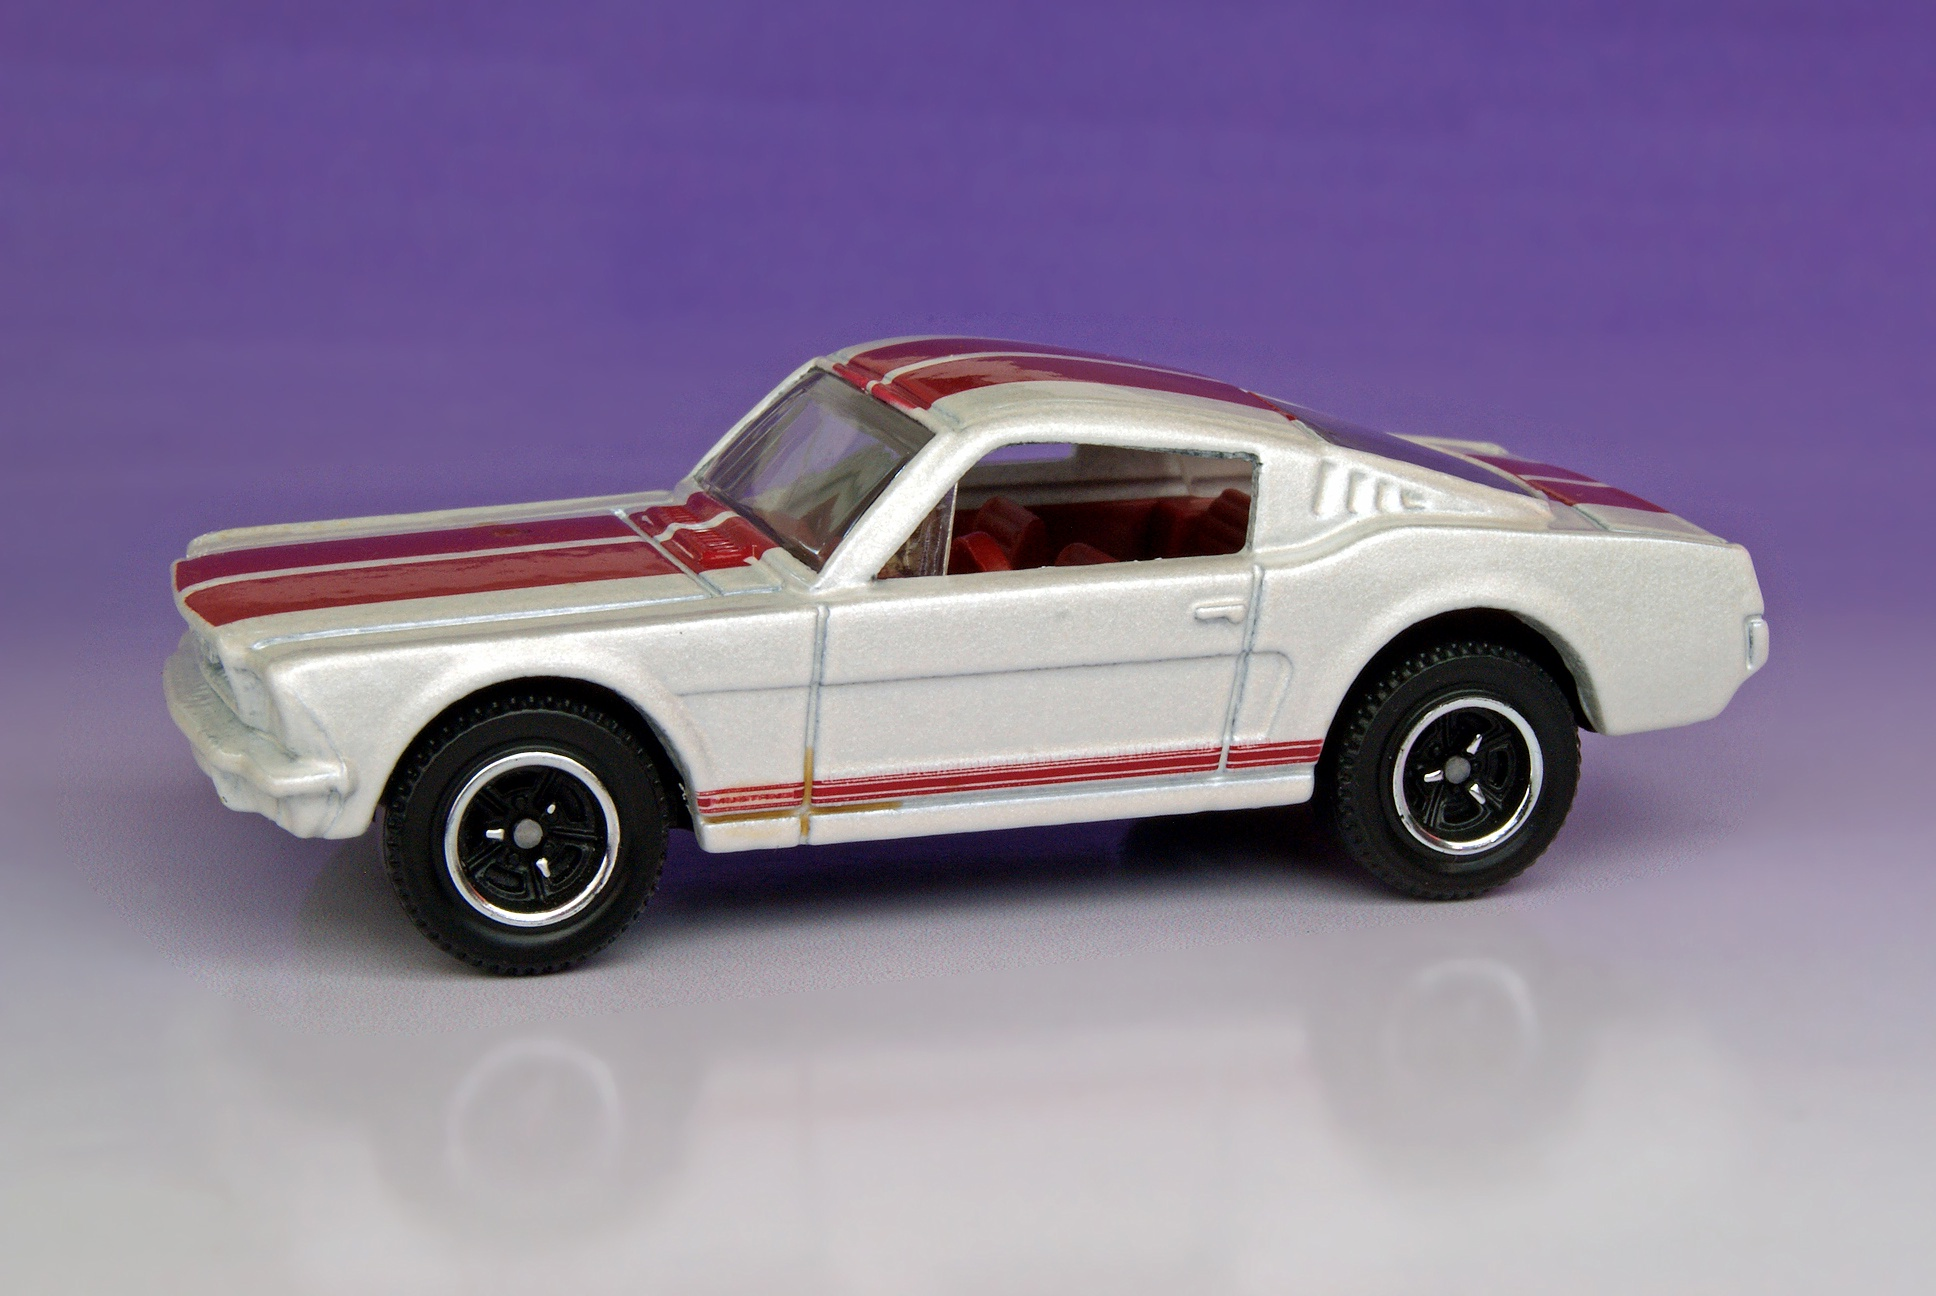 '65 Mustang GT | Matchbox Cars Wiki | FANDOM powered by Wikia